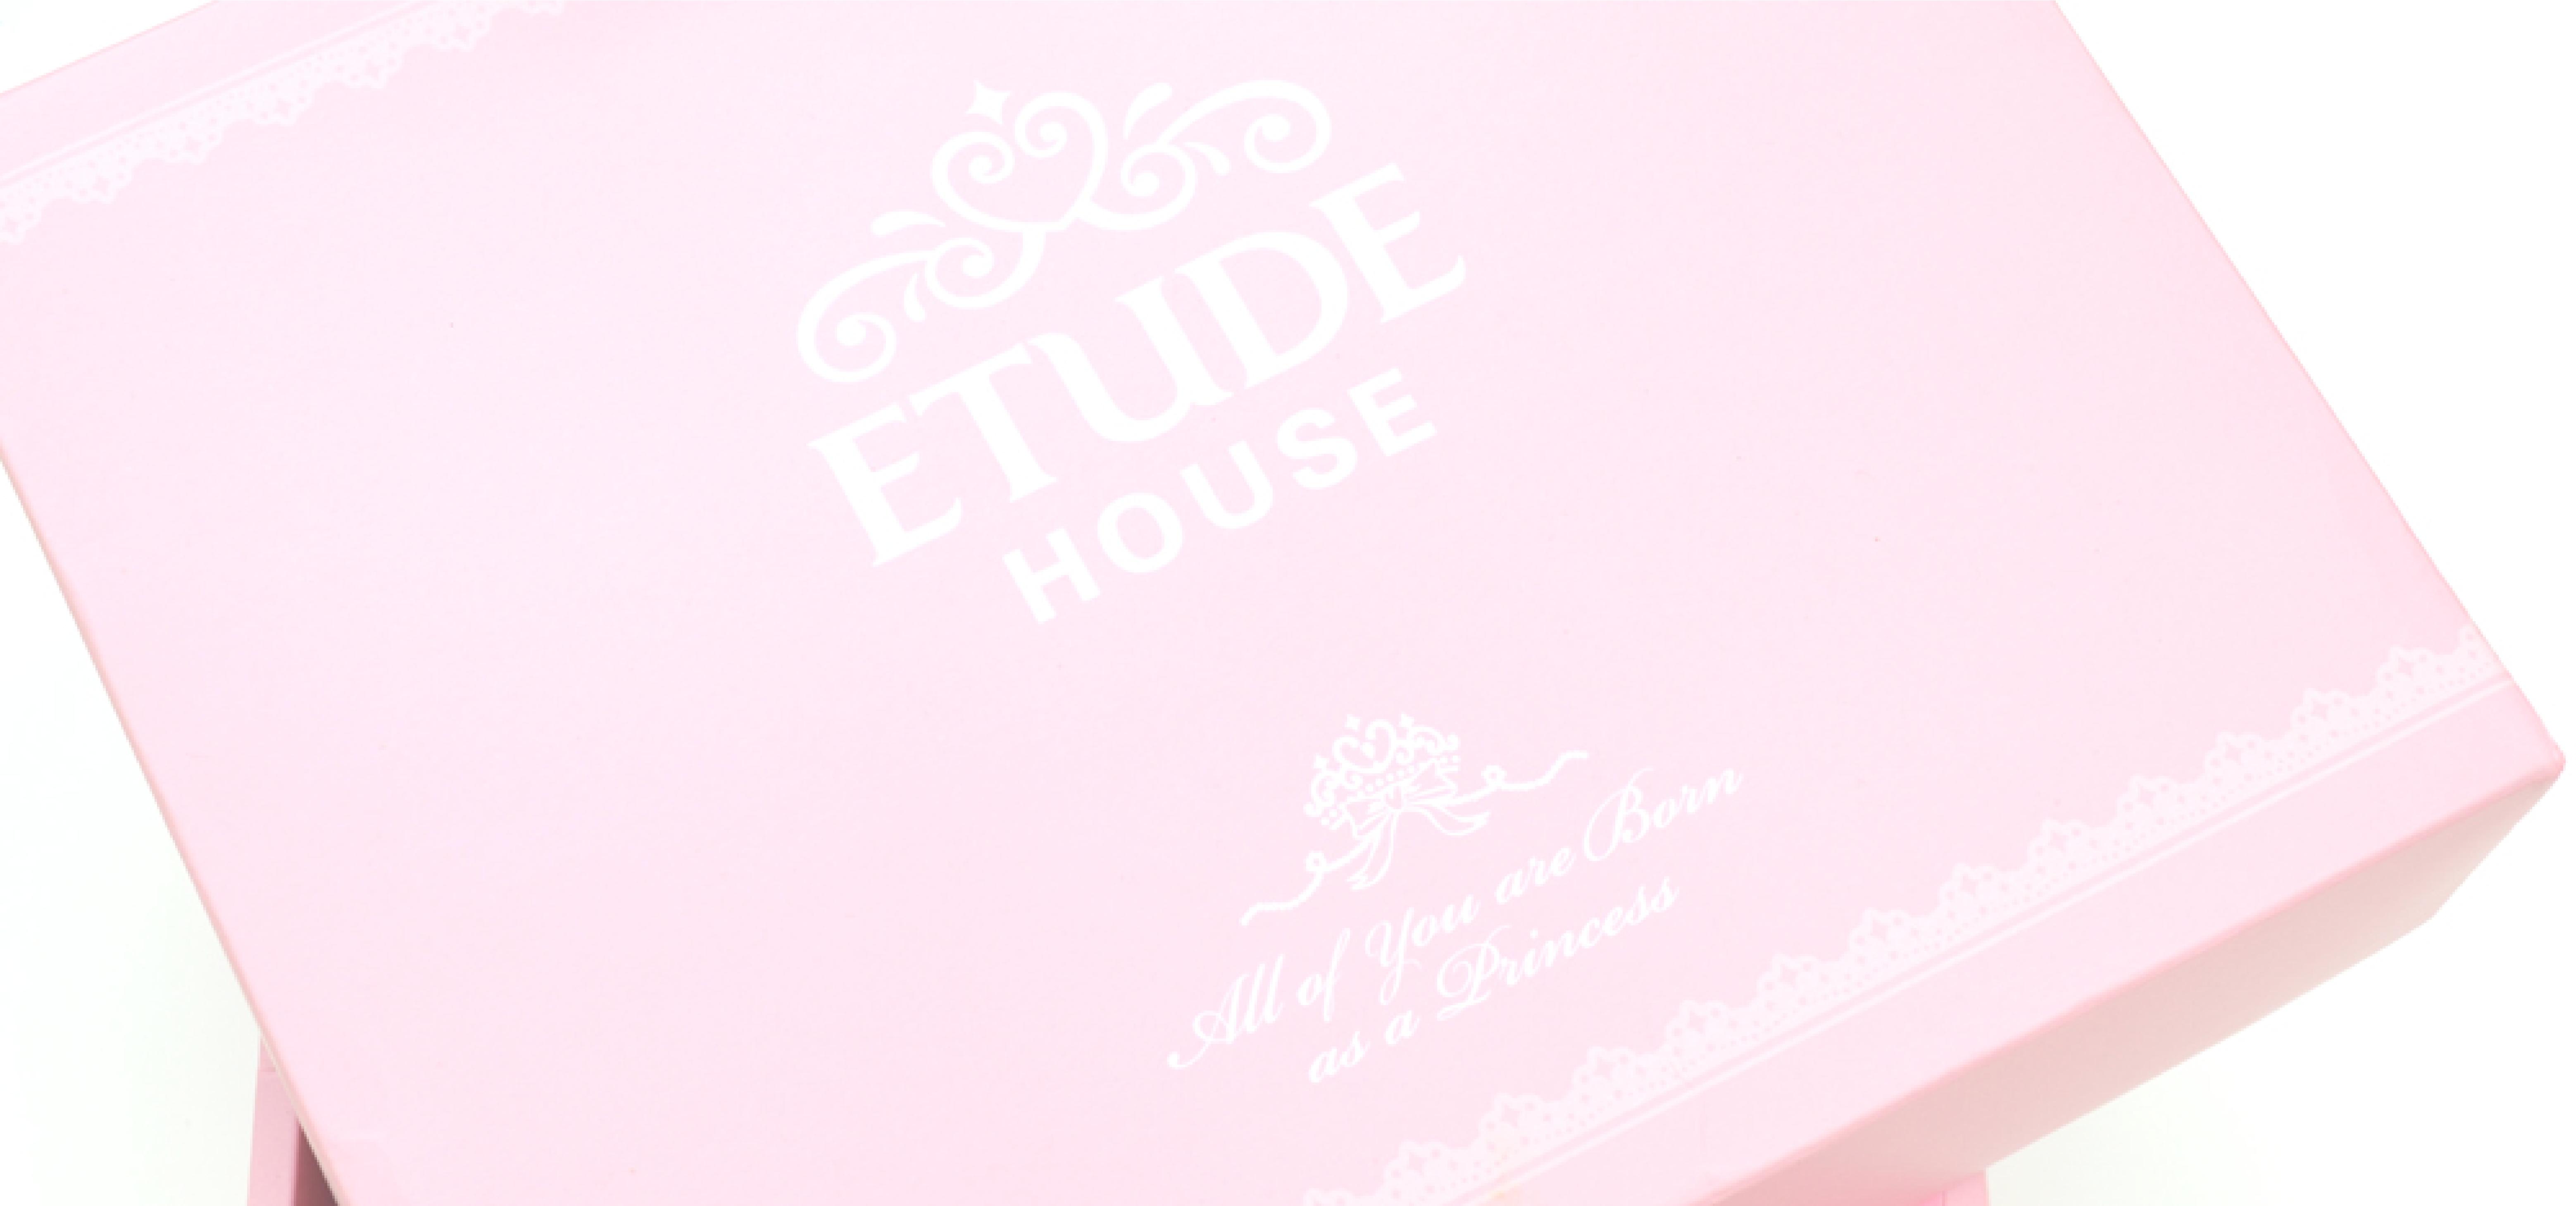 etude-house-pink-bird-box-cosmetiques-coreens-avis-revue